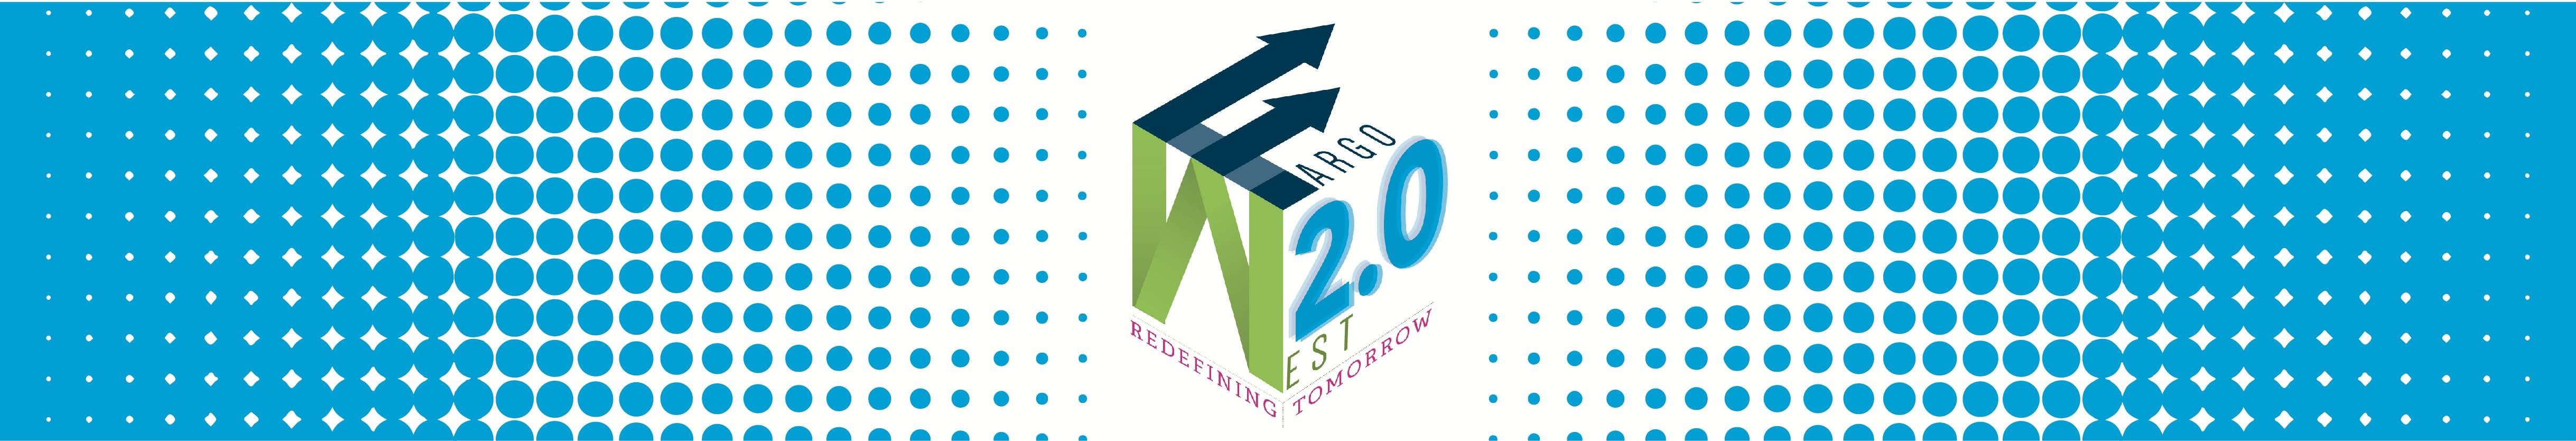 WF 2.0